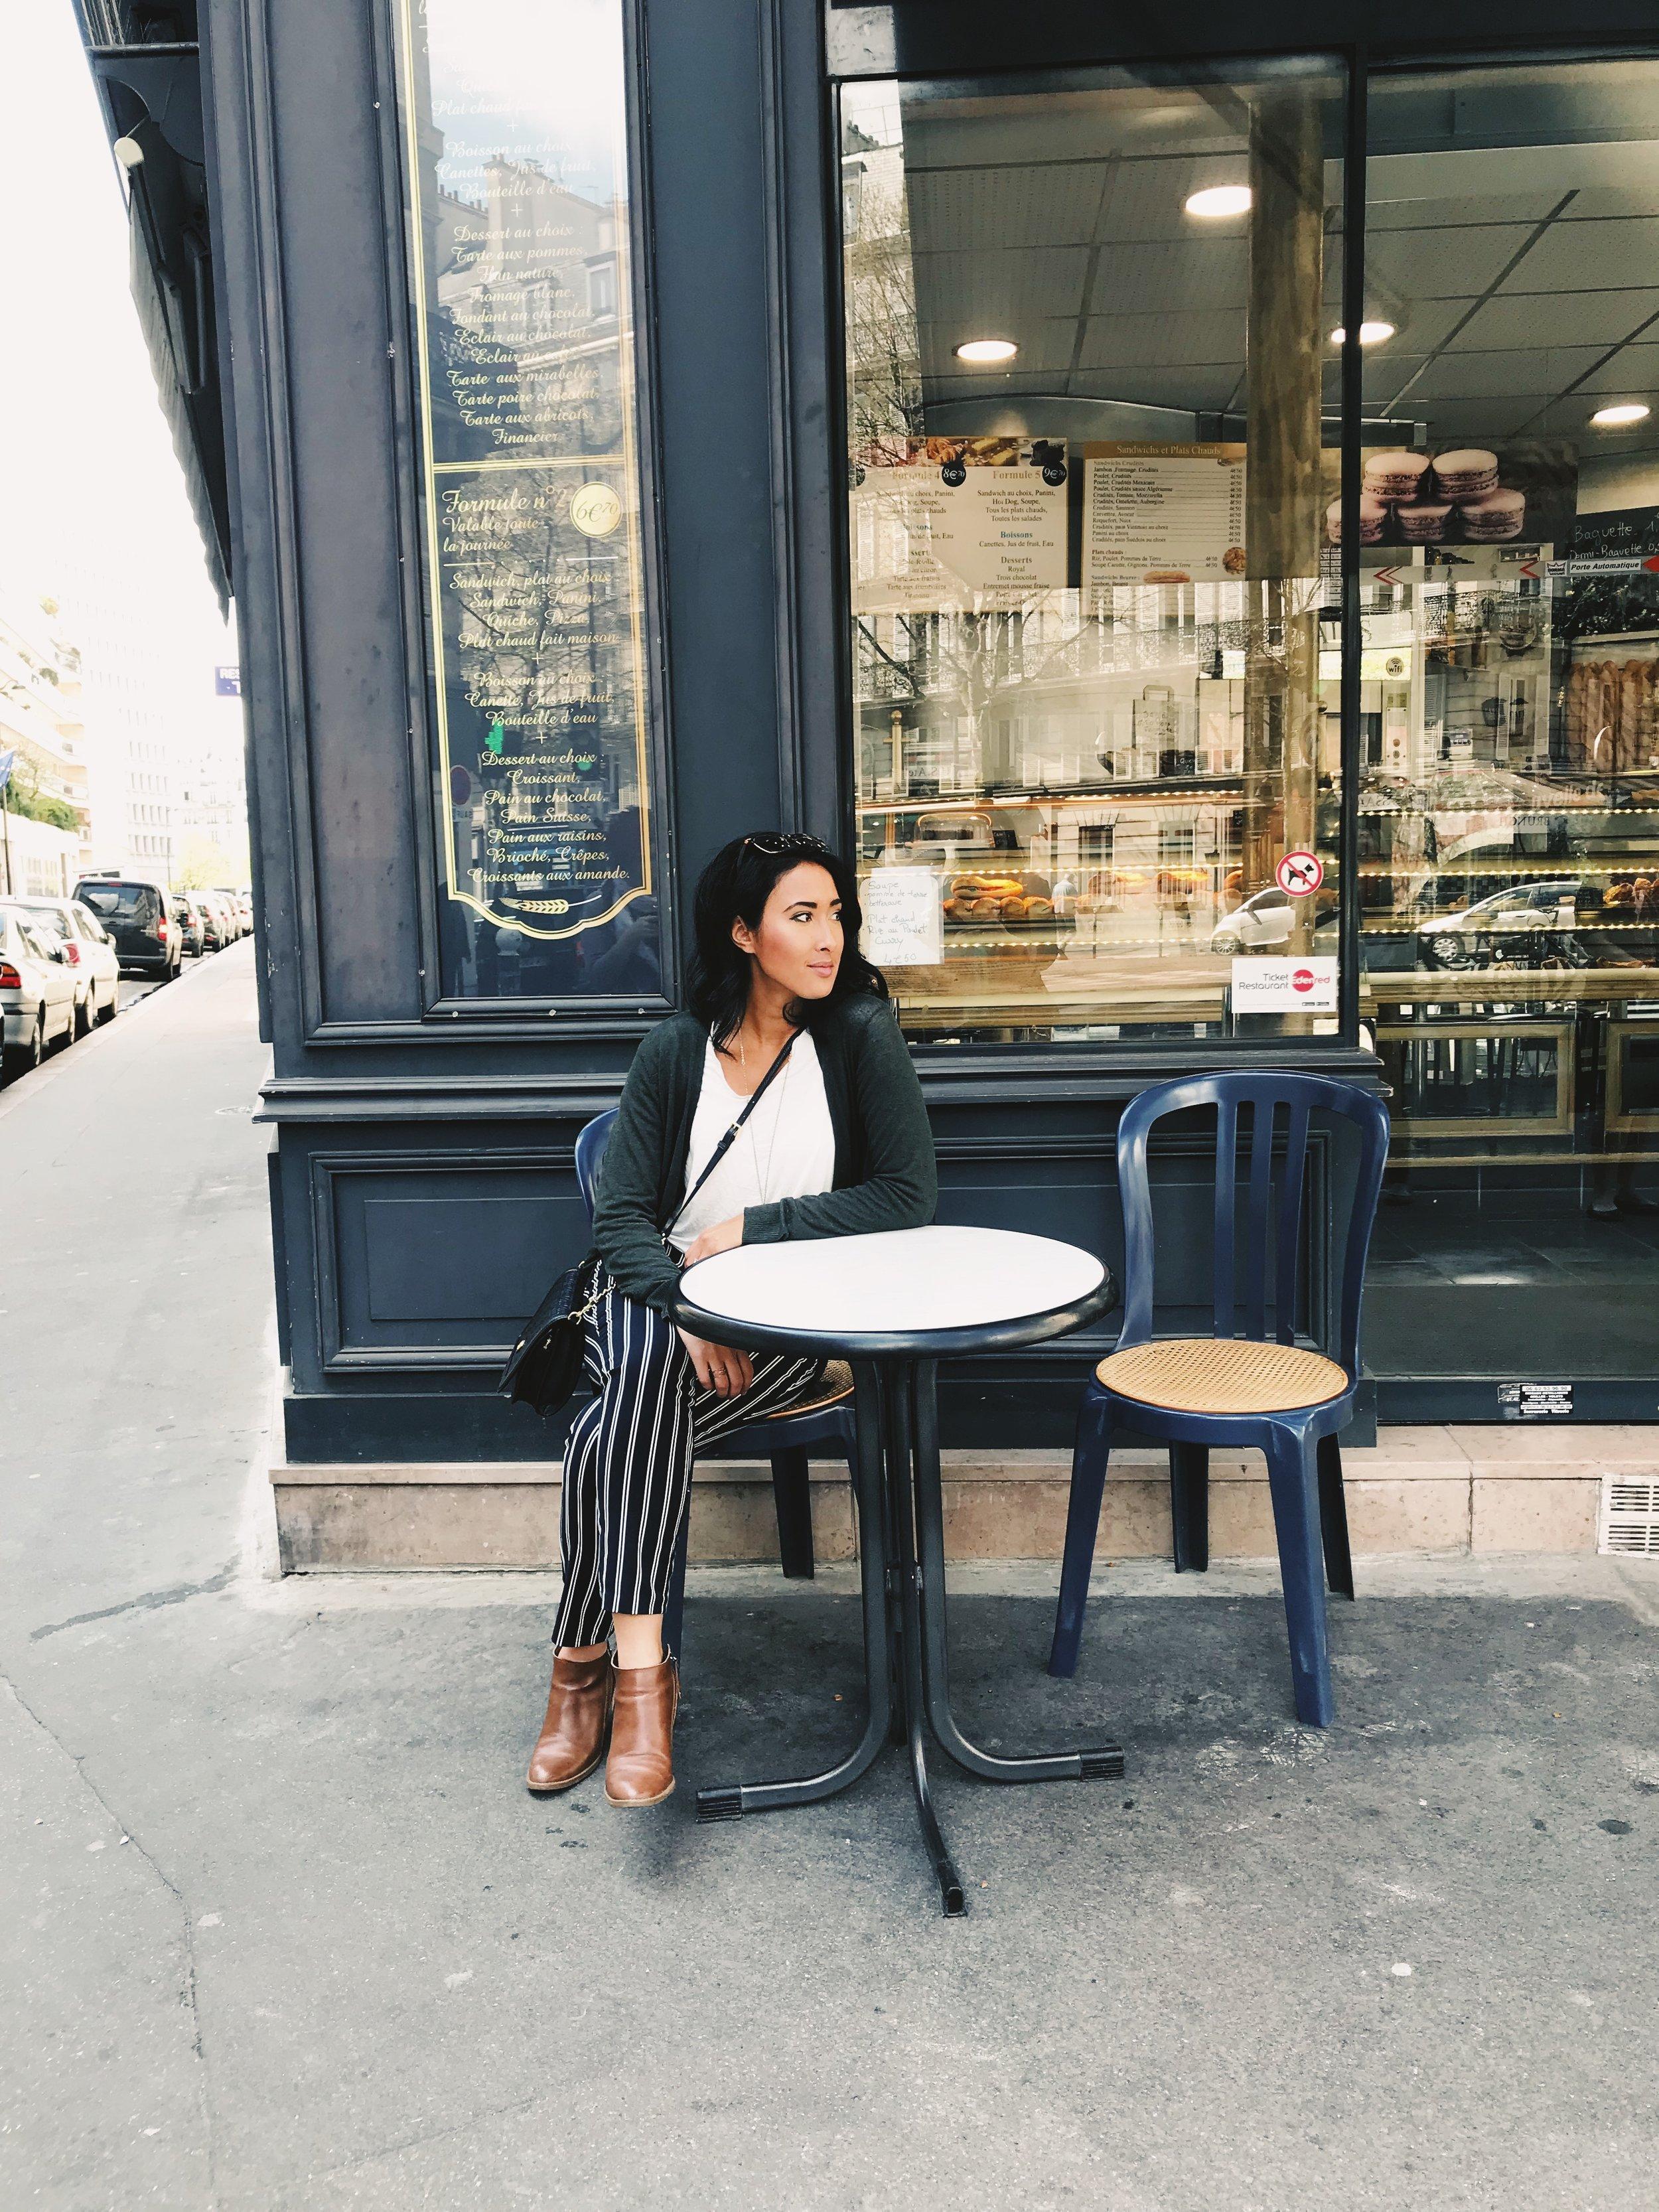 Paris Boulangerie photo.JPG